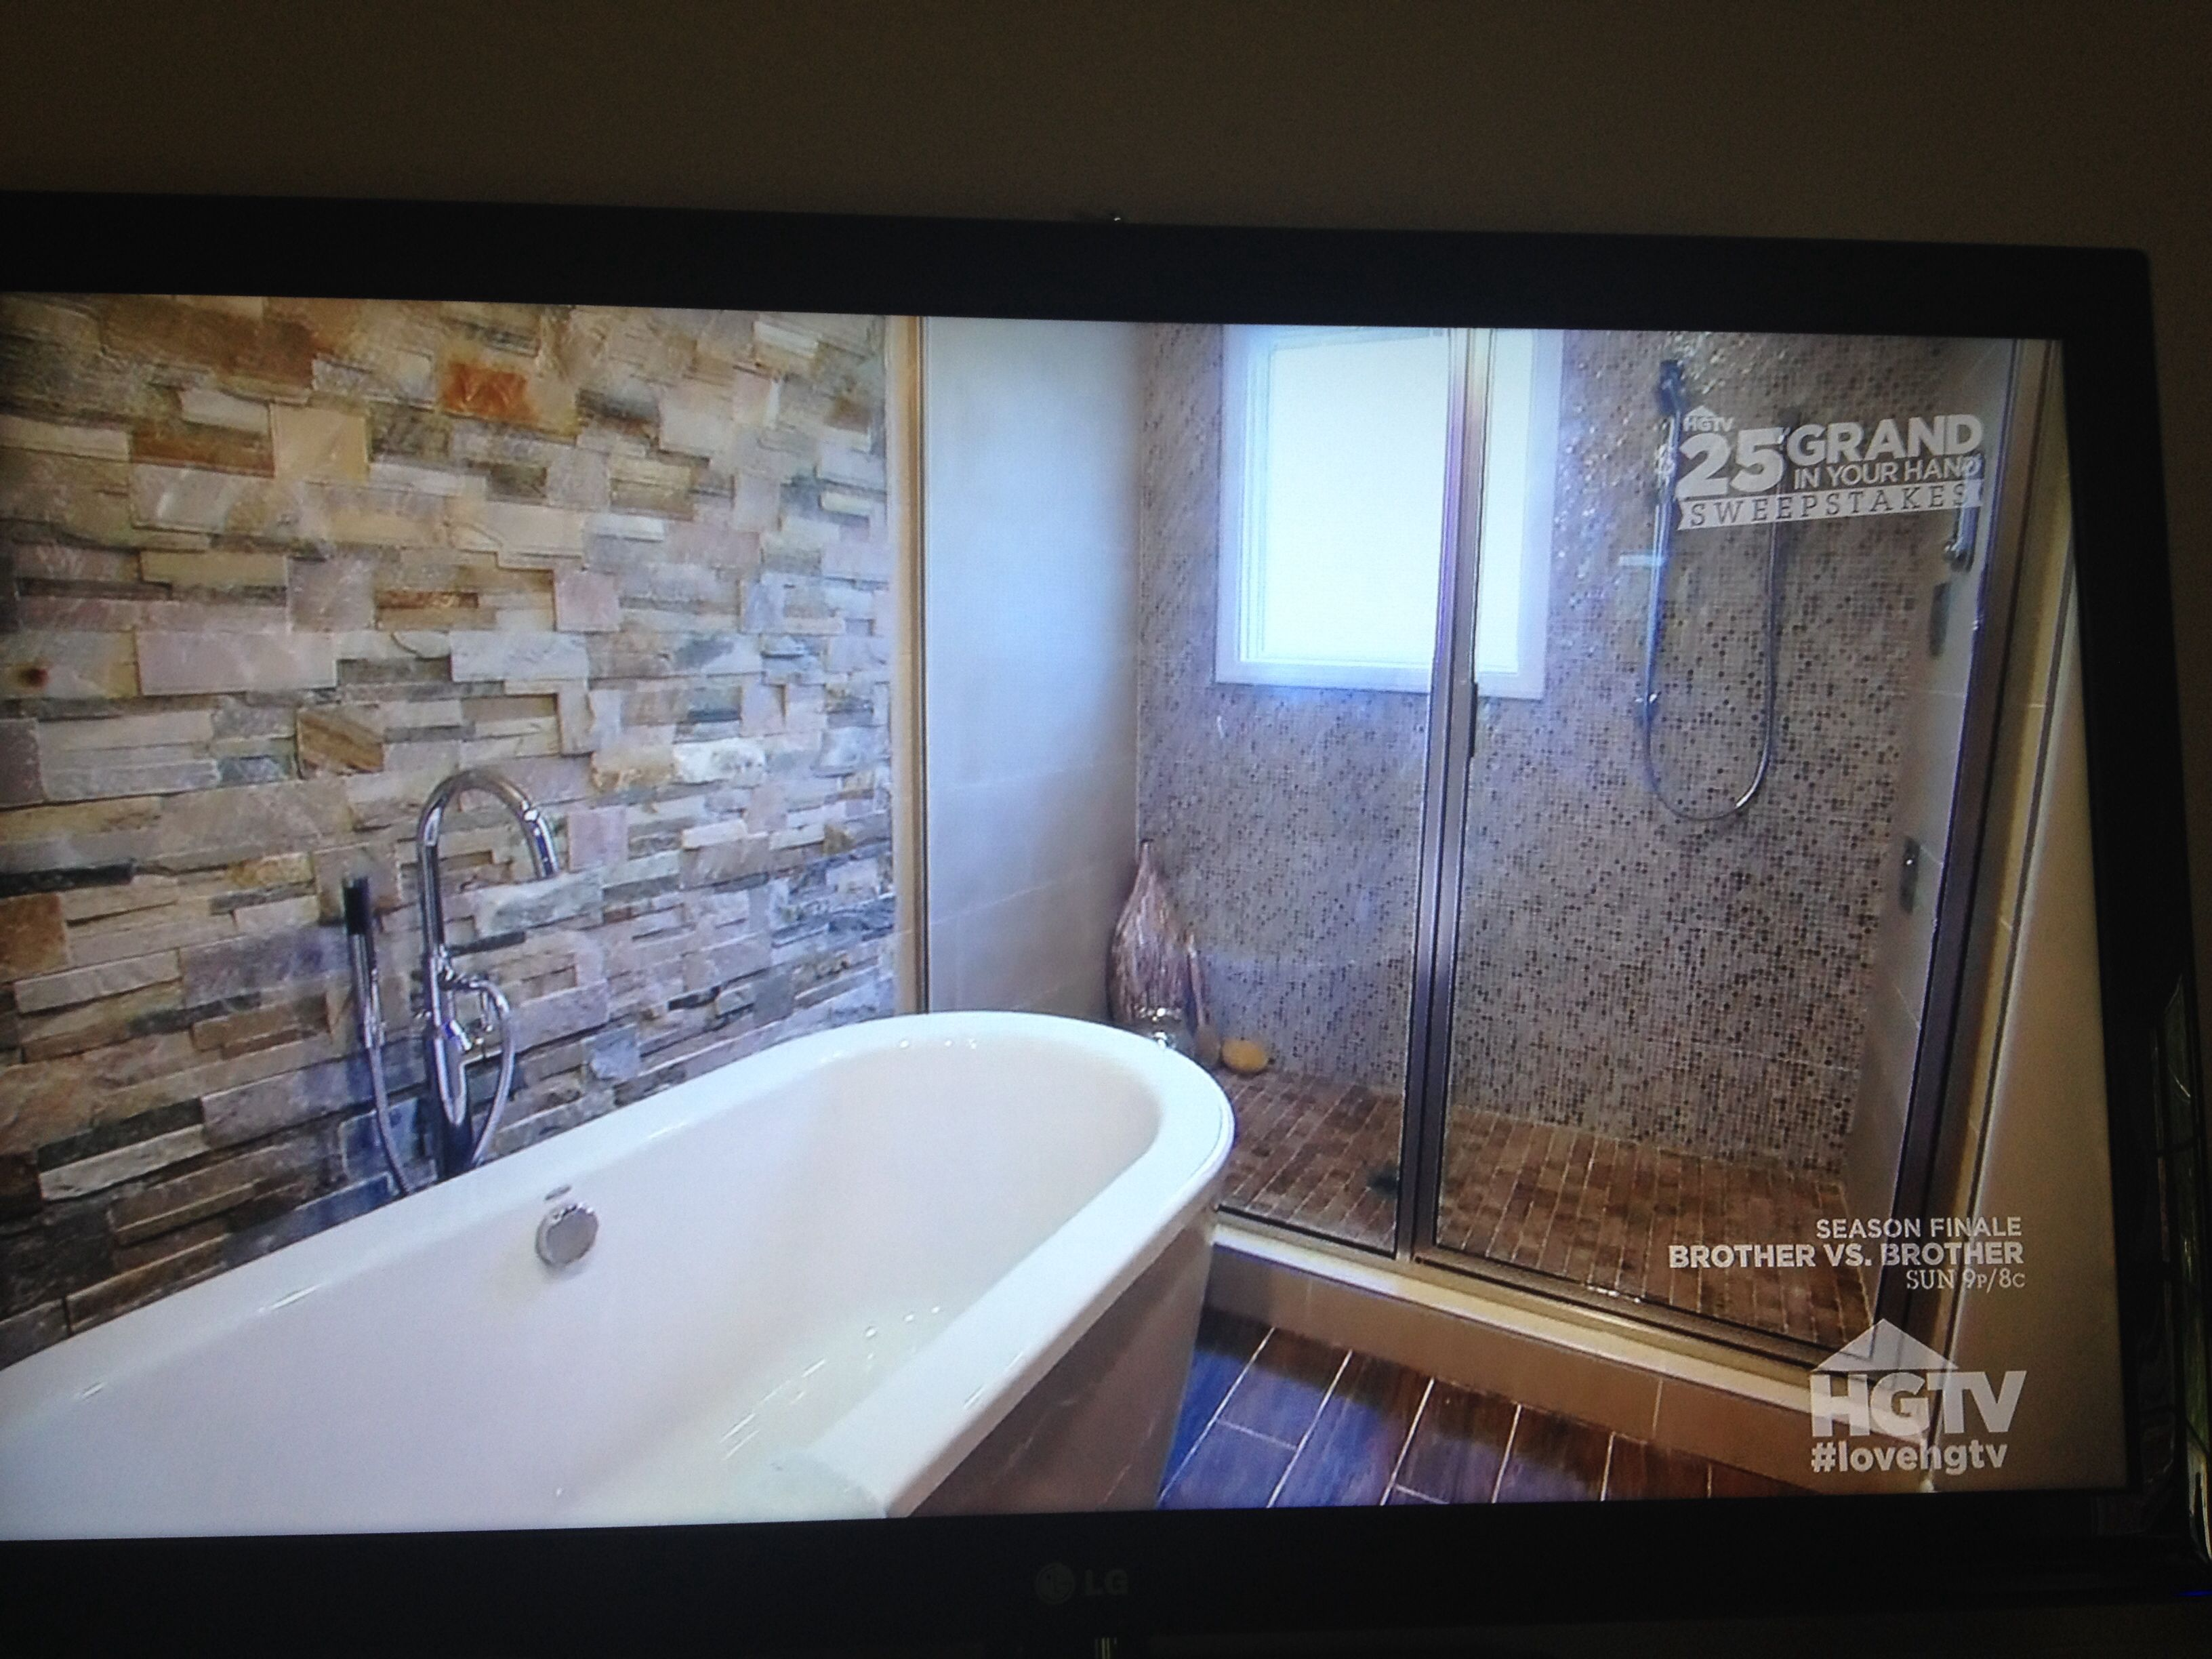 Property brothers bathroom bath tubs pinterest for Property brothers bathroom photos